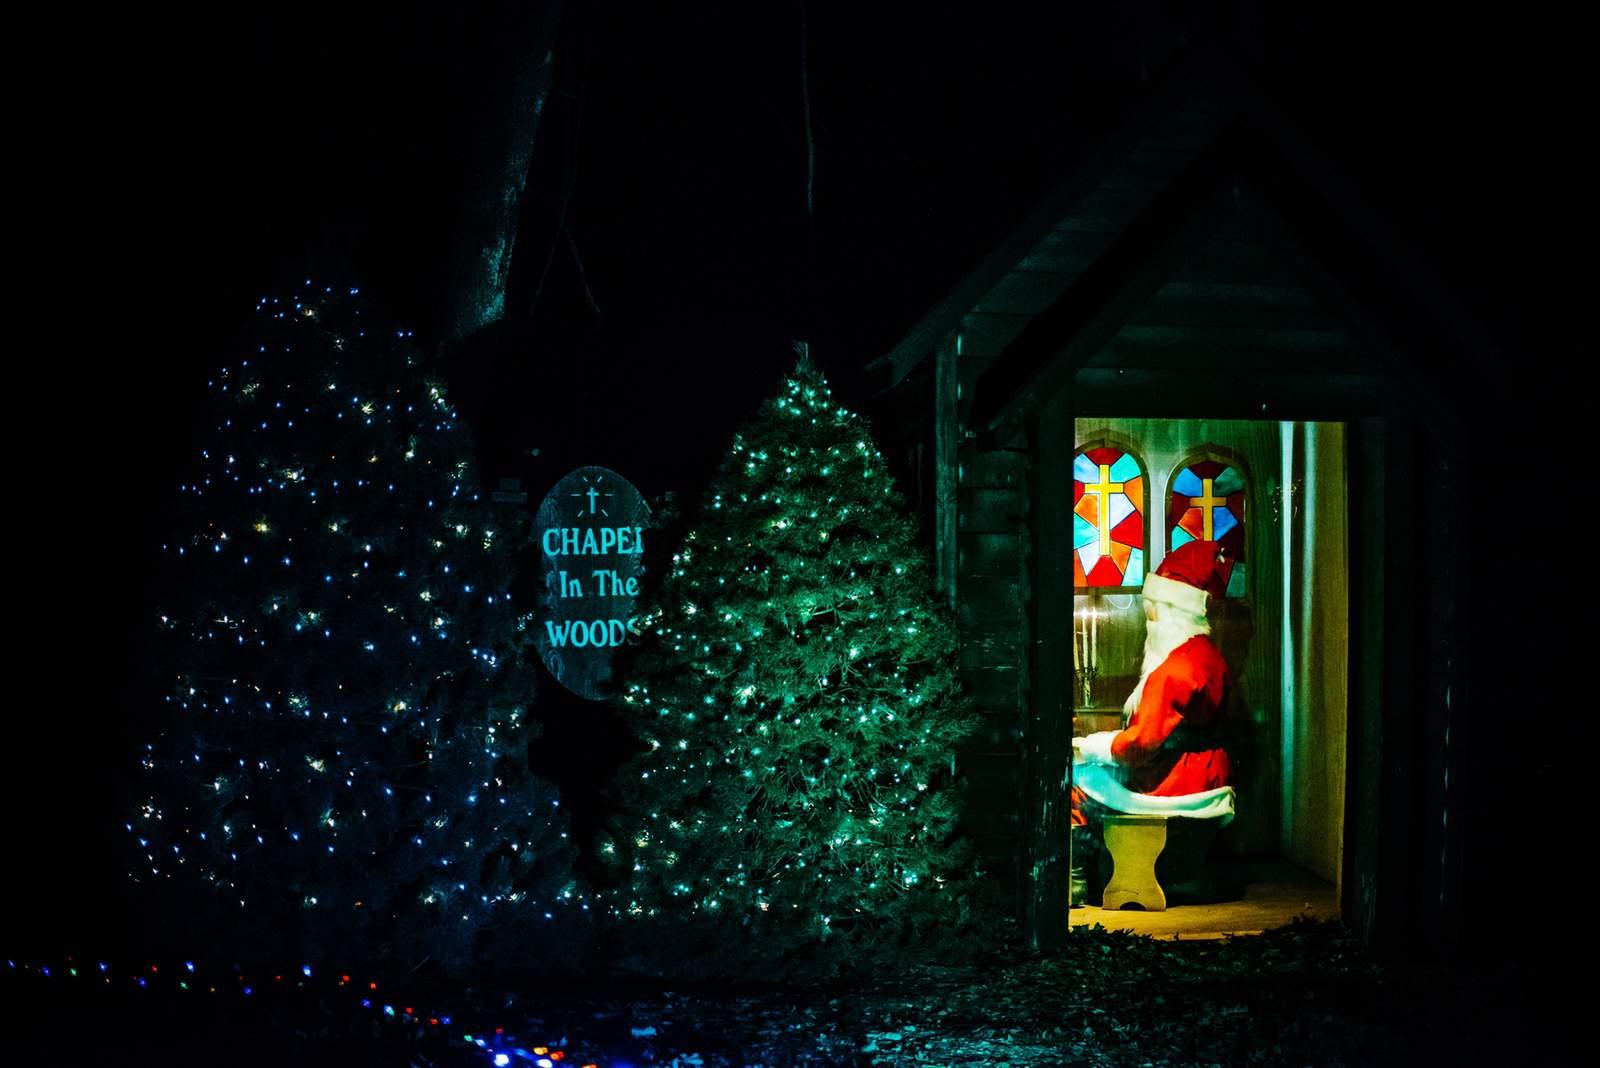 Shepherd Of The Hills Christmas Lights 2021 Branson S 1 Drive Though Trail Of Lights Shepherd Of The Hills